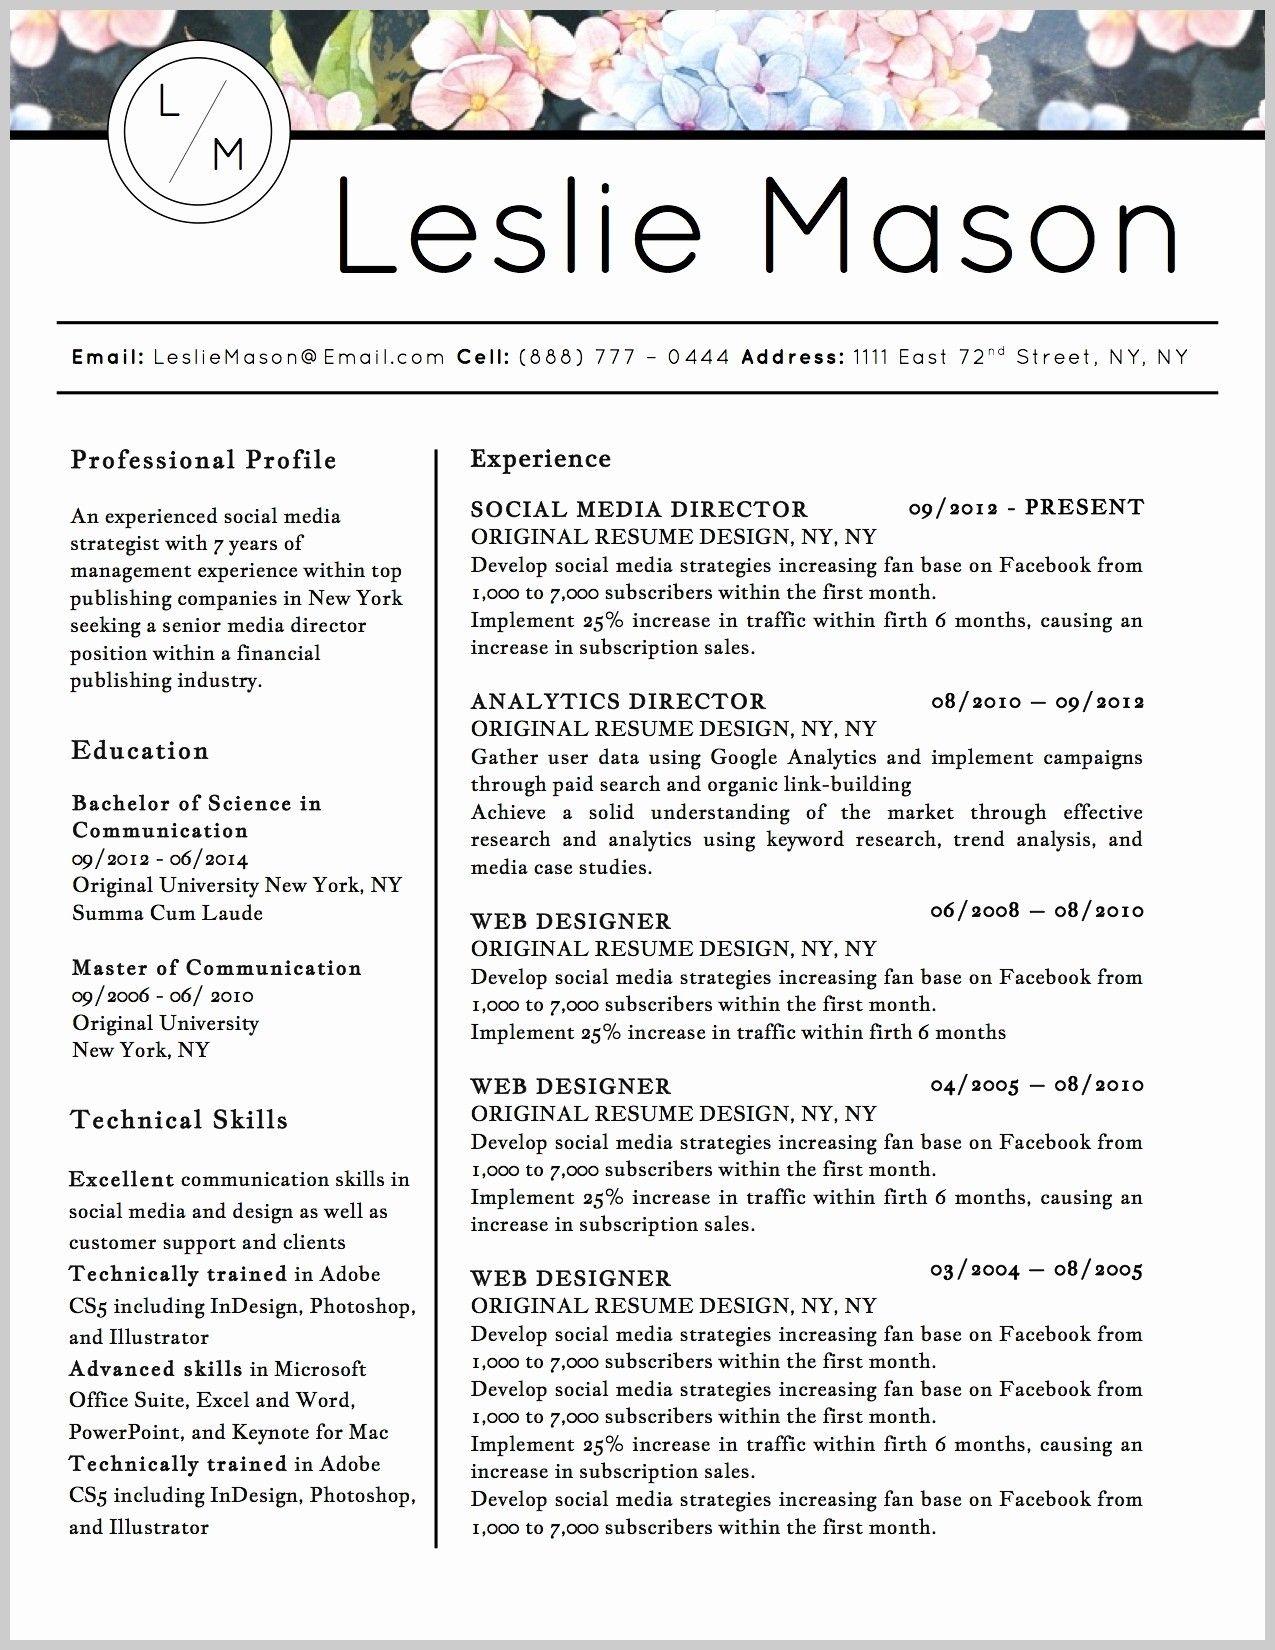 Resume Templates Paid Resume Templates Downloadable Resume Template Best Resume Template